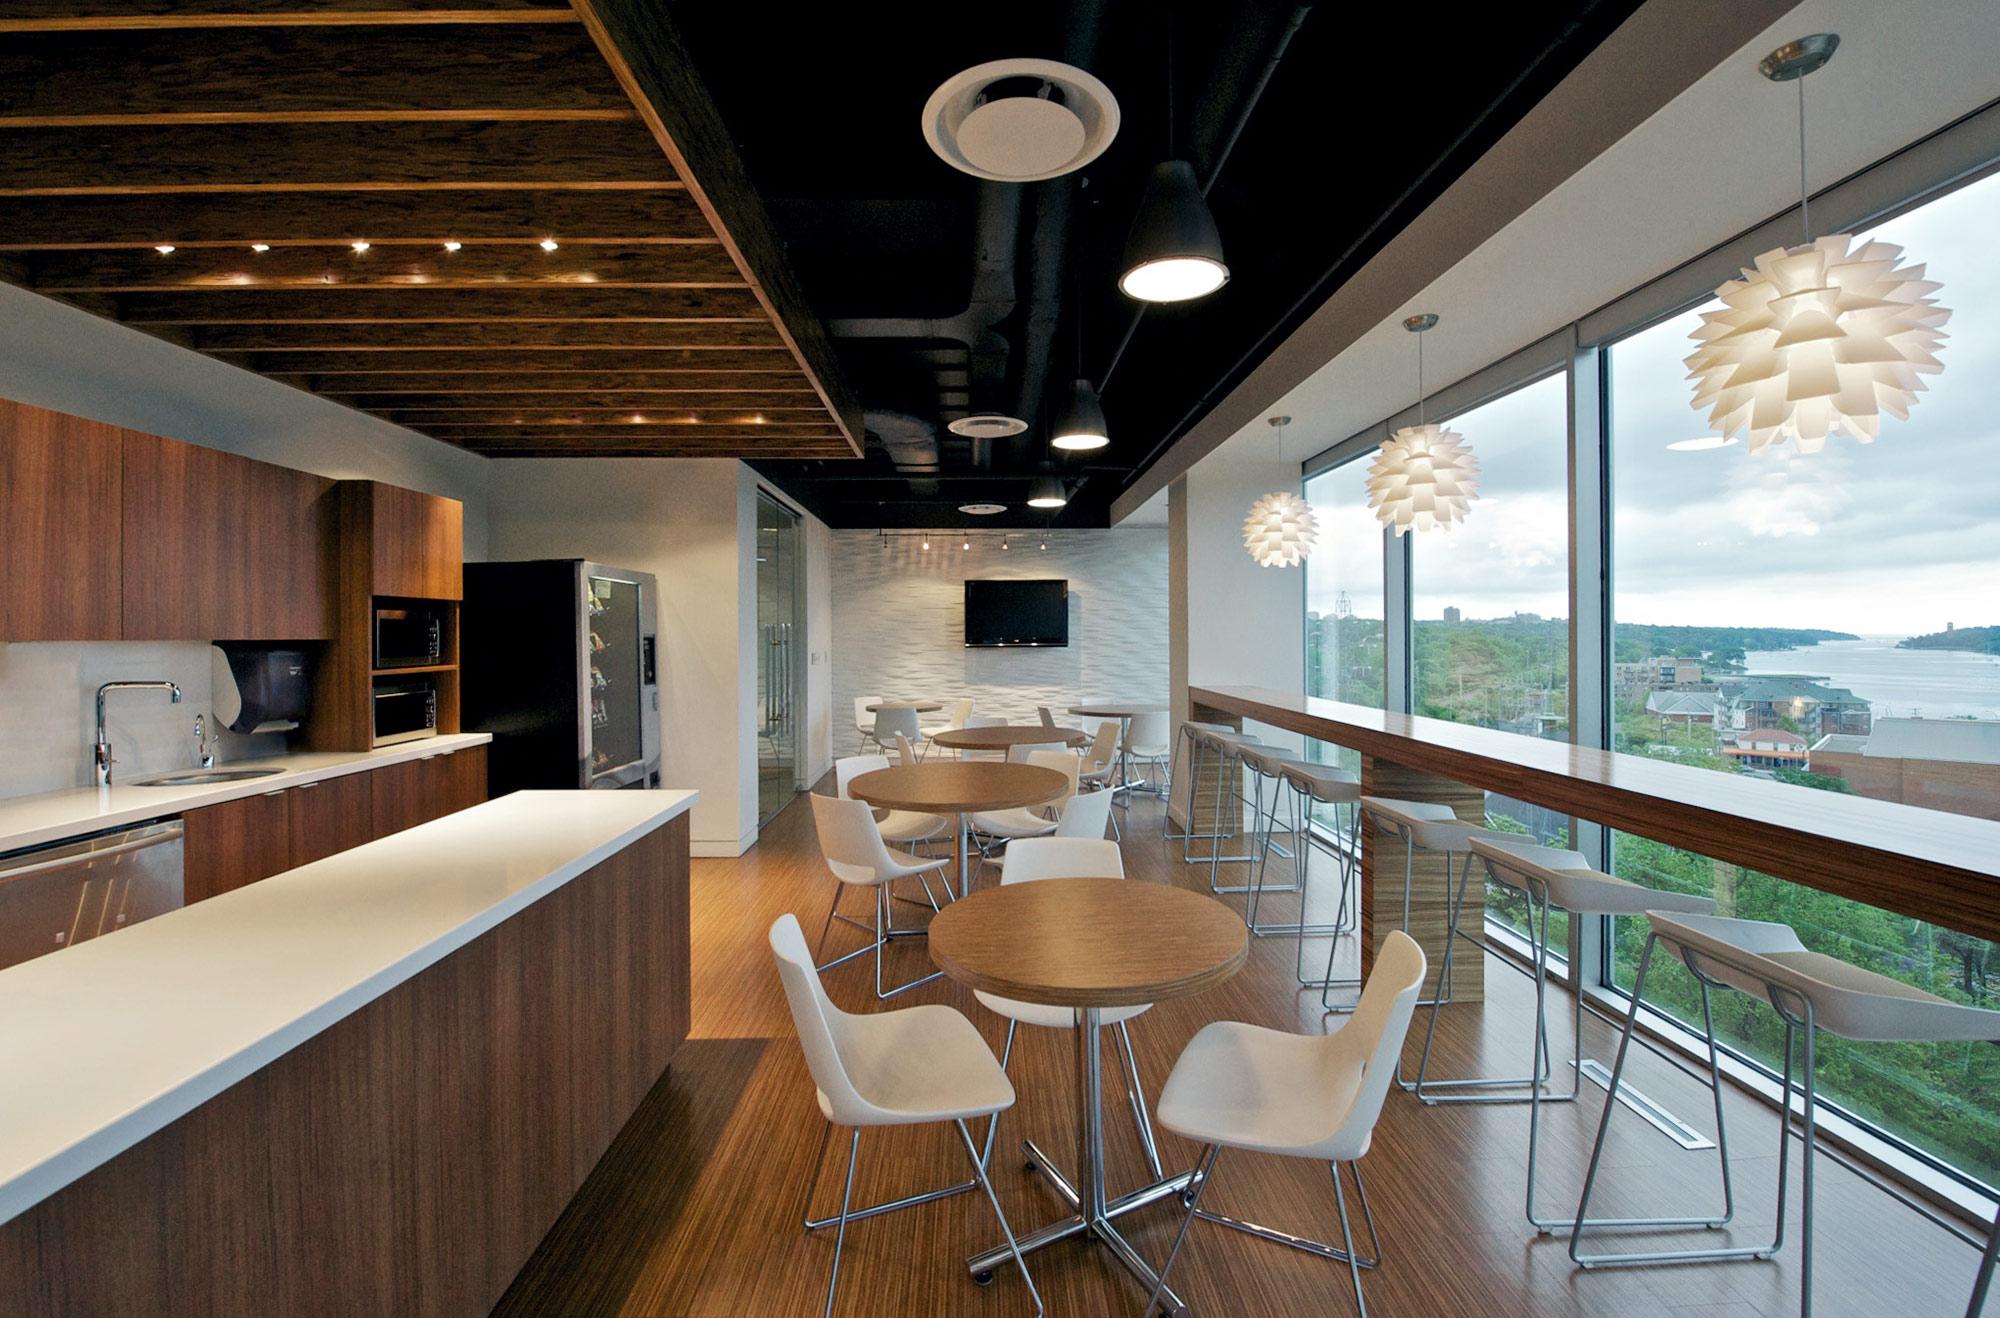 interior-design-media-office-kitchen-seating.jpg